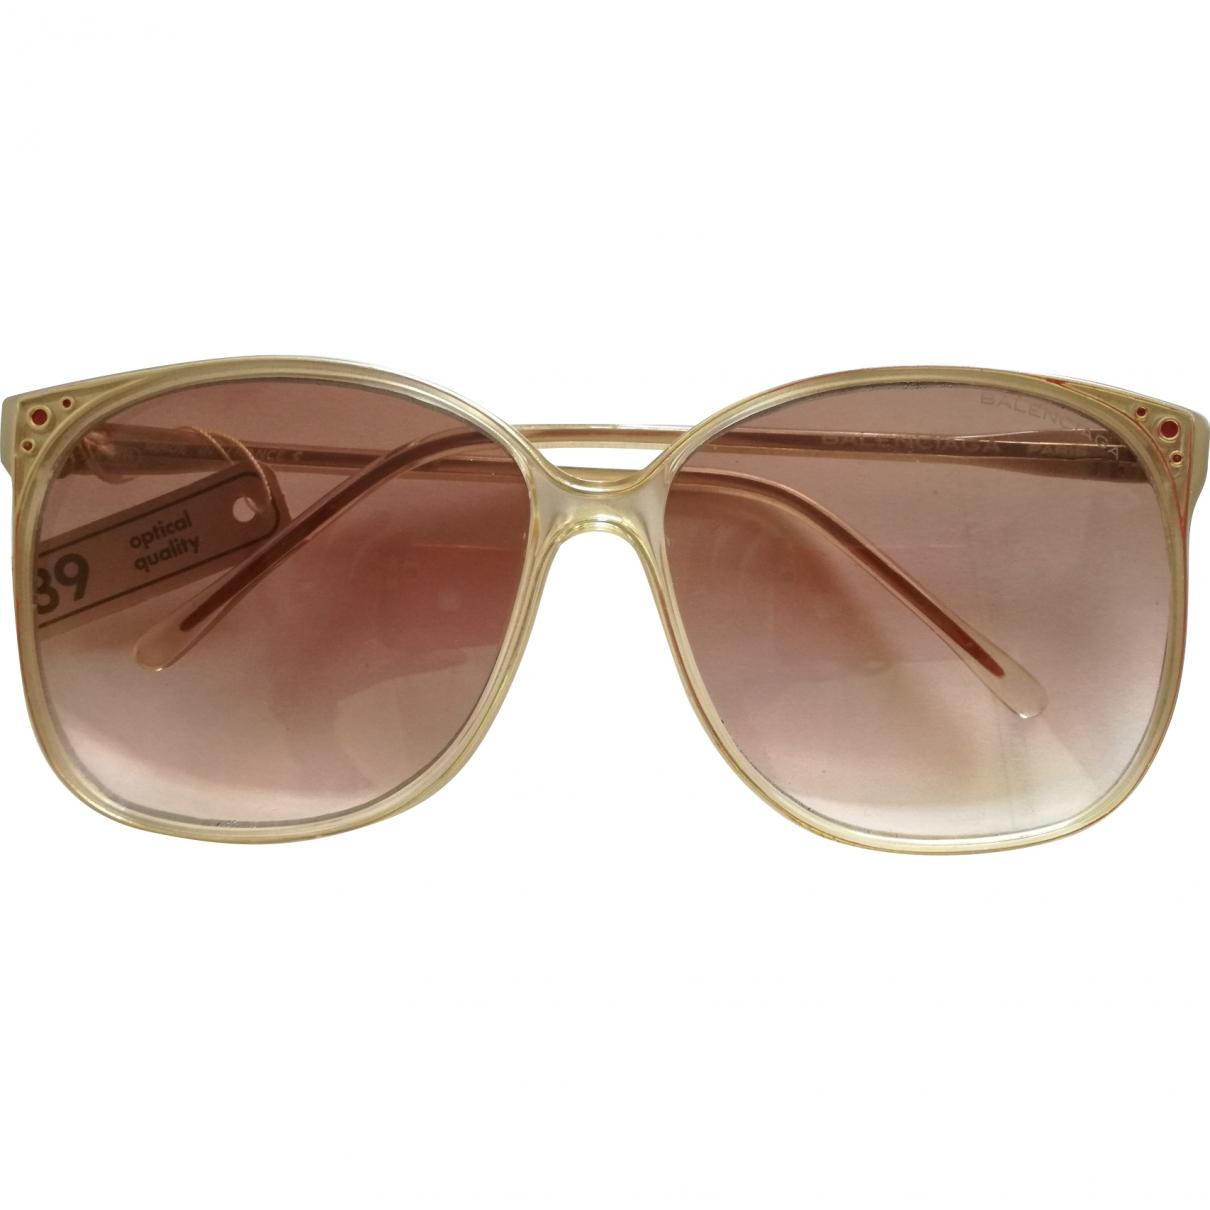 Balenciaga \N Beige Sunglasses for Women \N